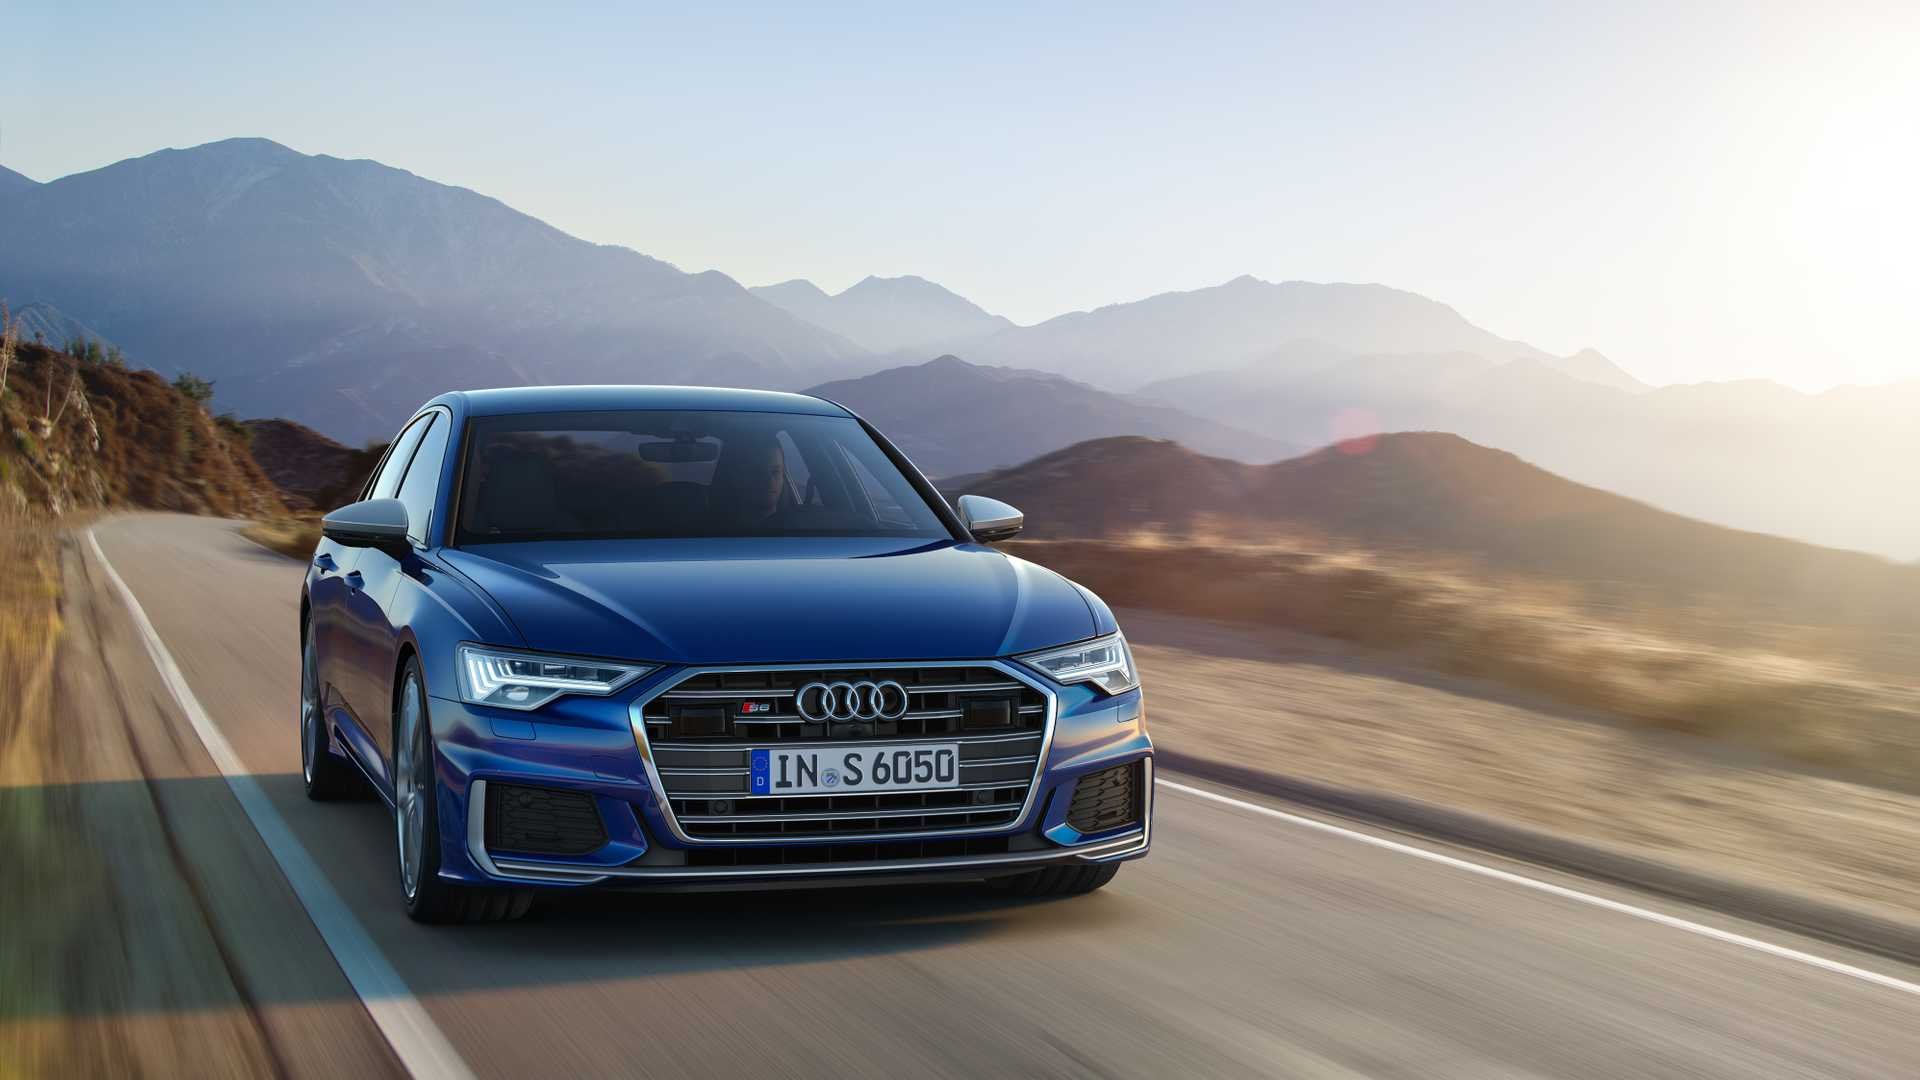 2019 Audi S6 Sedan TDI (Color: Navarra Blue) Front Wallpaper (5)